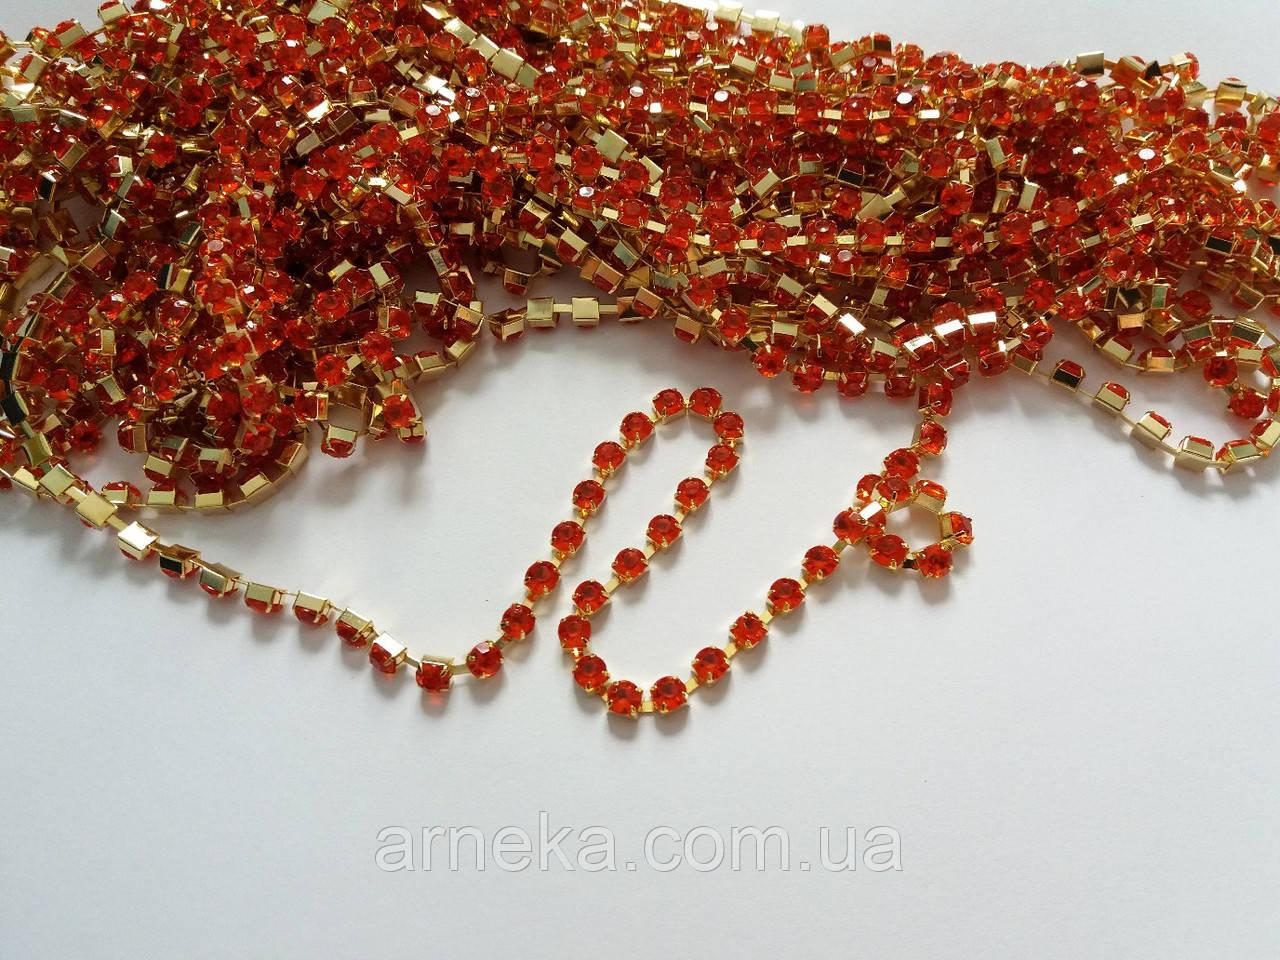 Ланцюжок зі стразами 0,4 см 50 см акрил червона в золоті